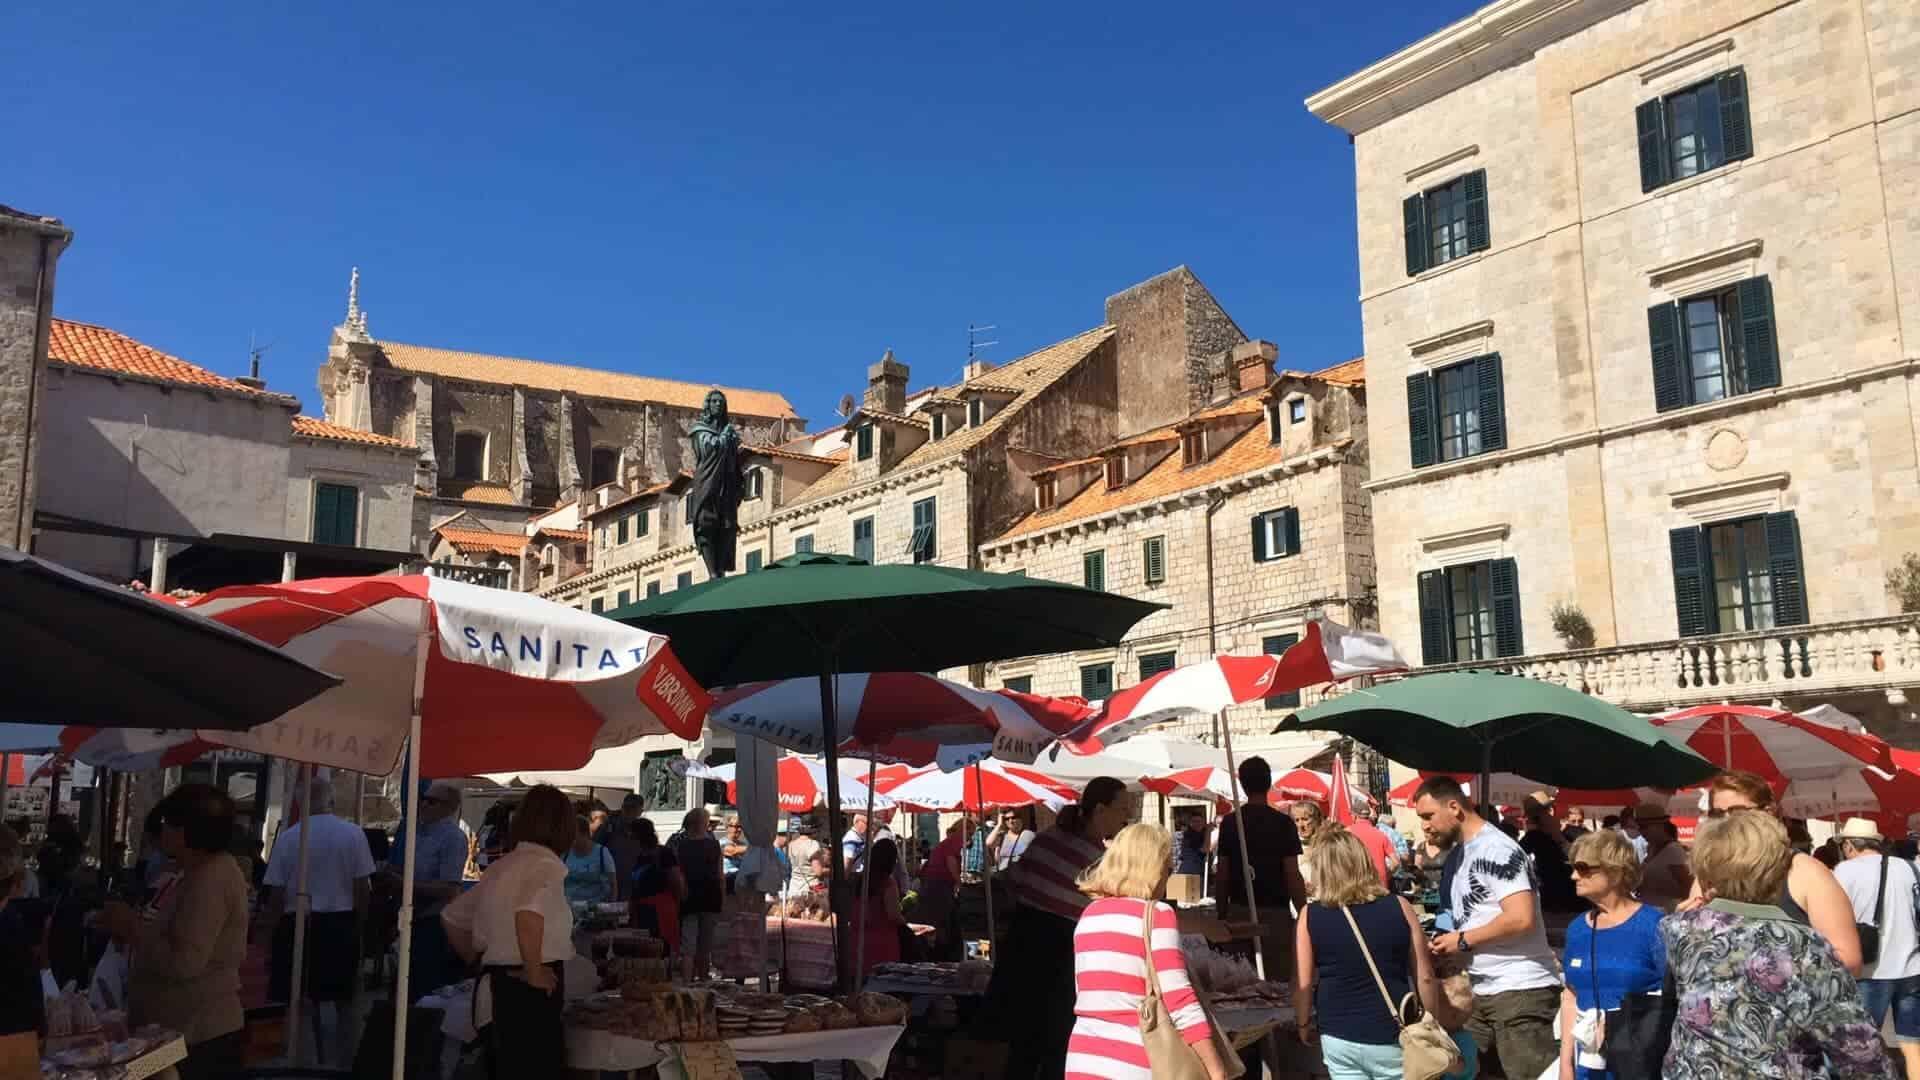 Discover dubrovnik old town guided walking tour - Morning Market Dubrovnik